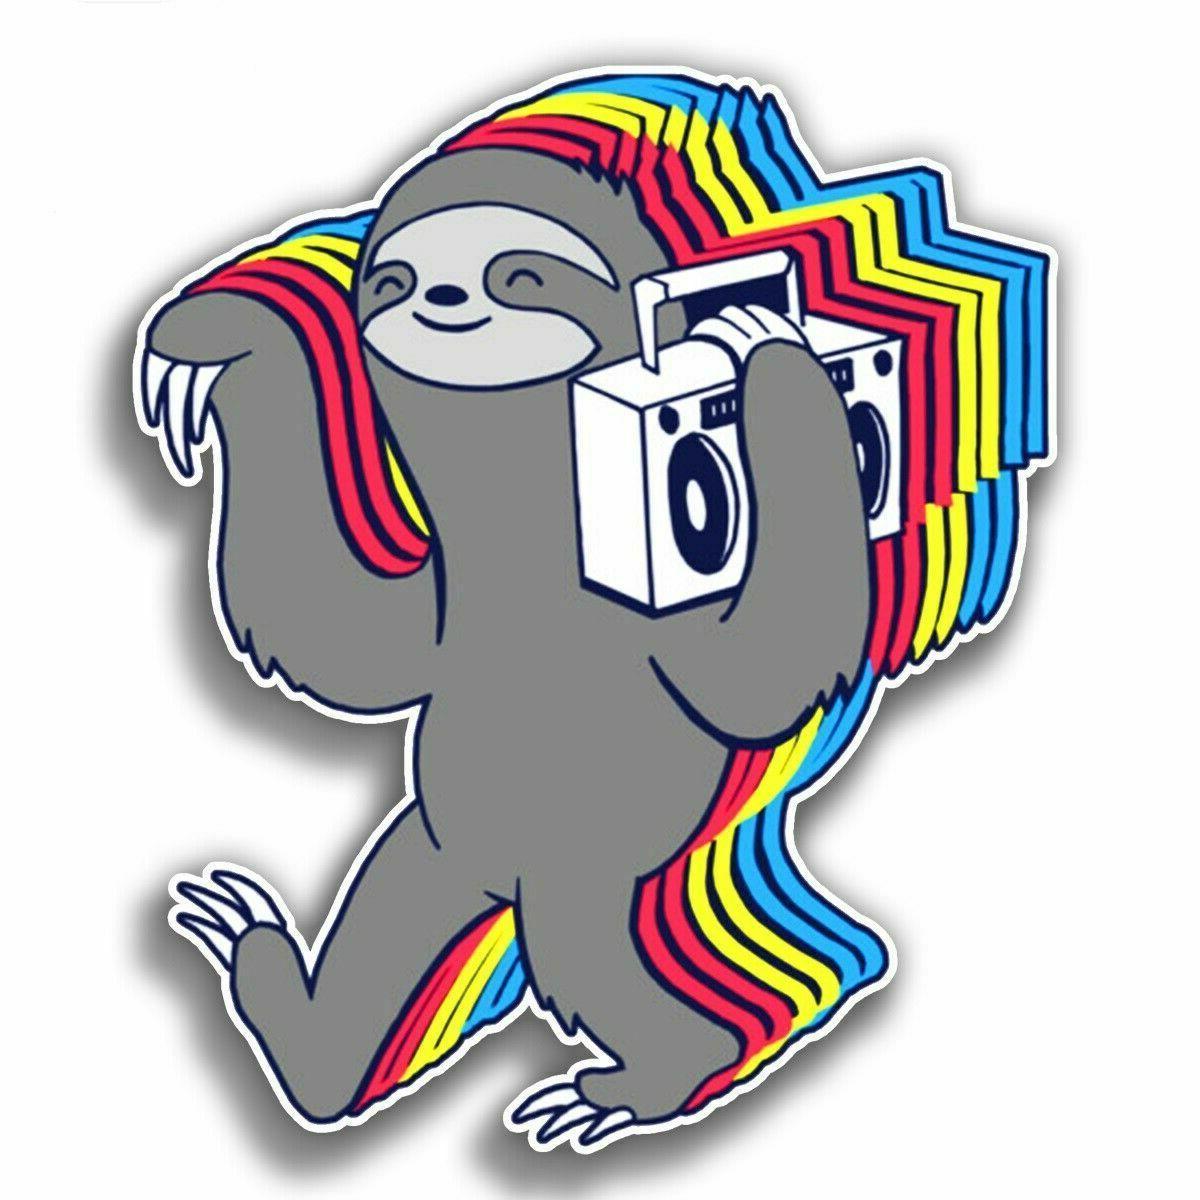 sloth vinyl sticker laptop luggage tumbler